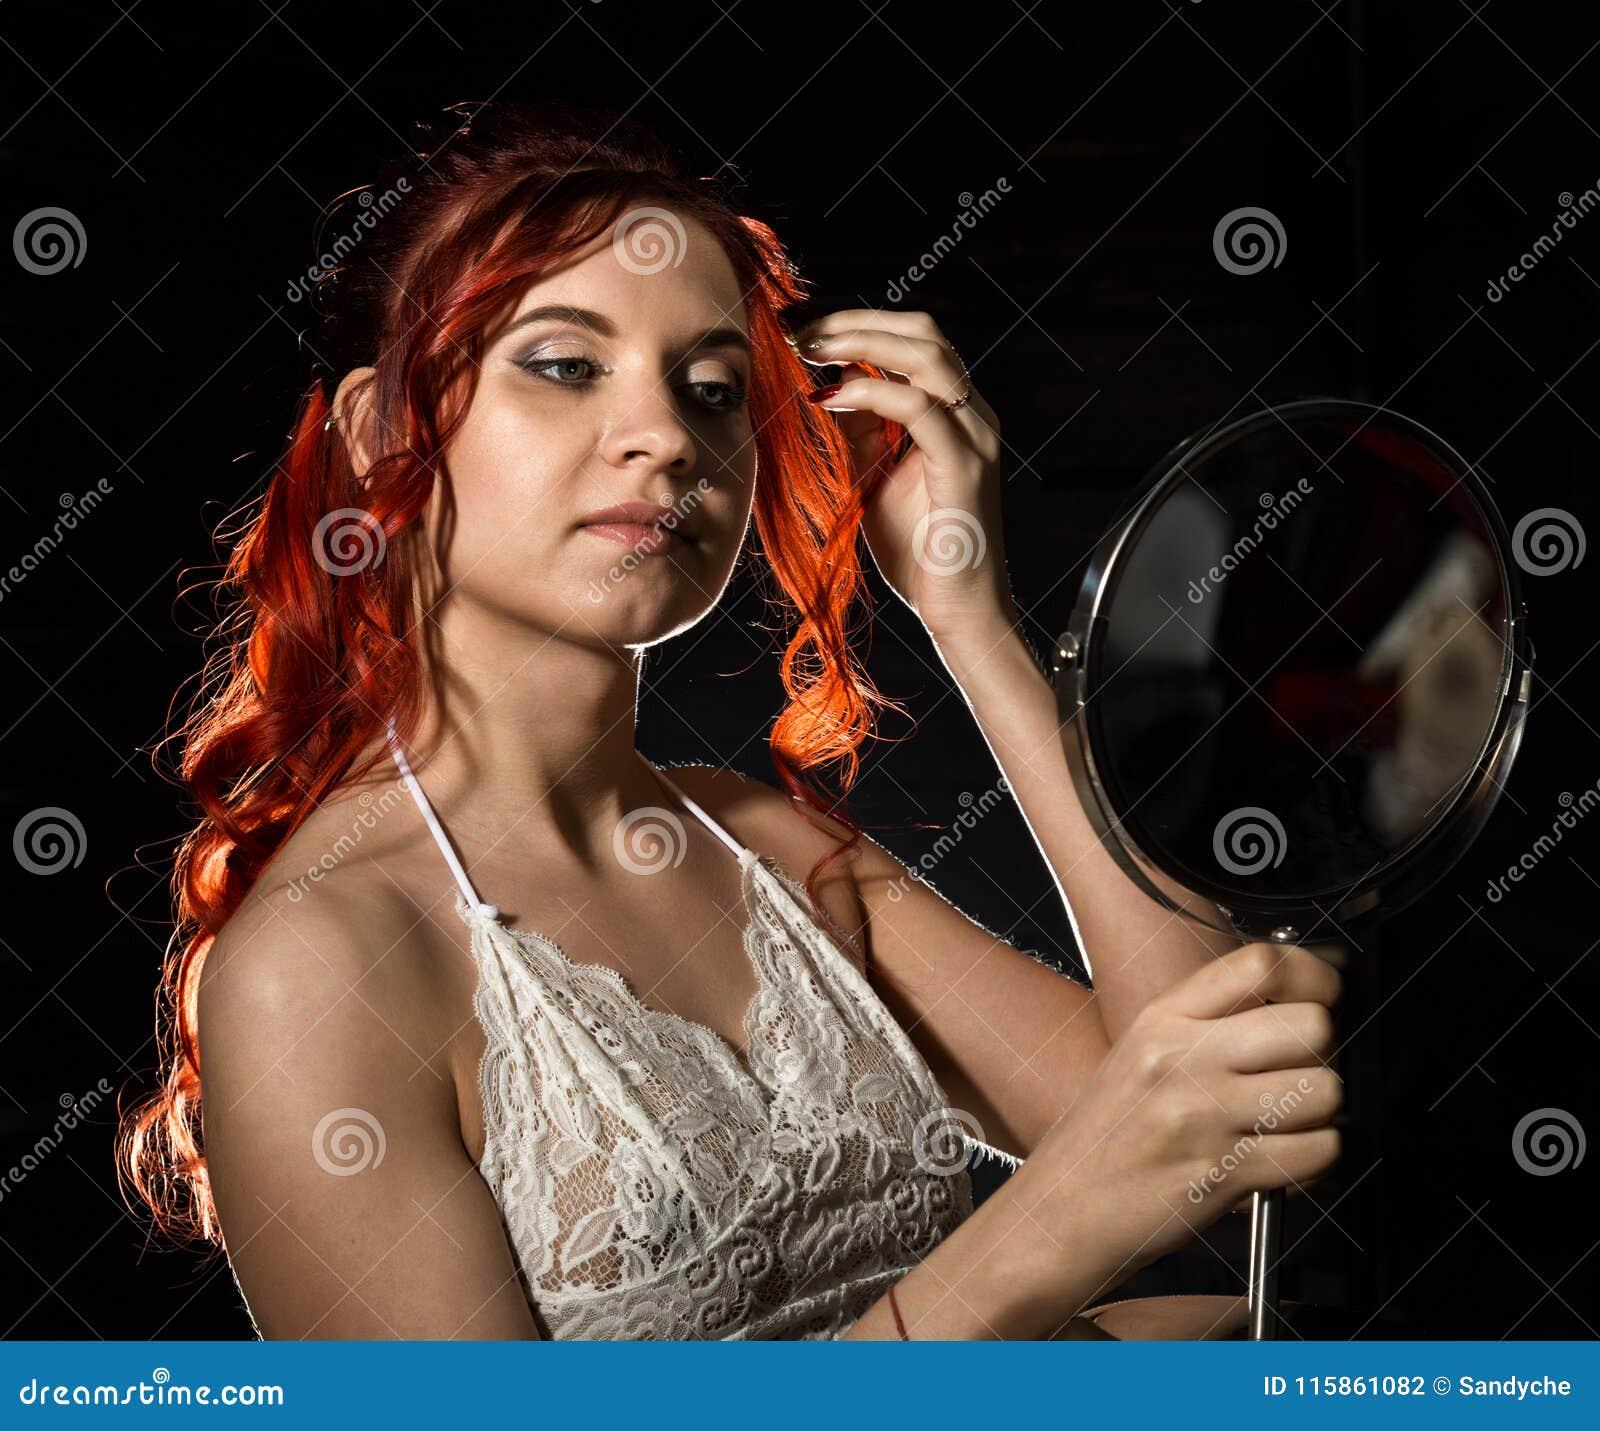 Redhead eating a brunnette